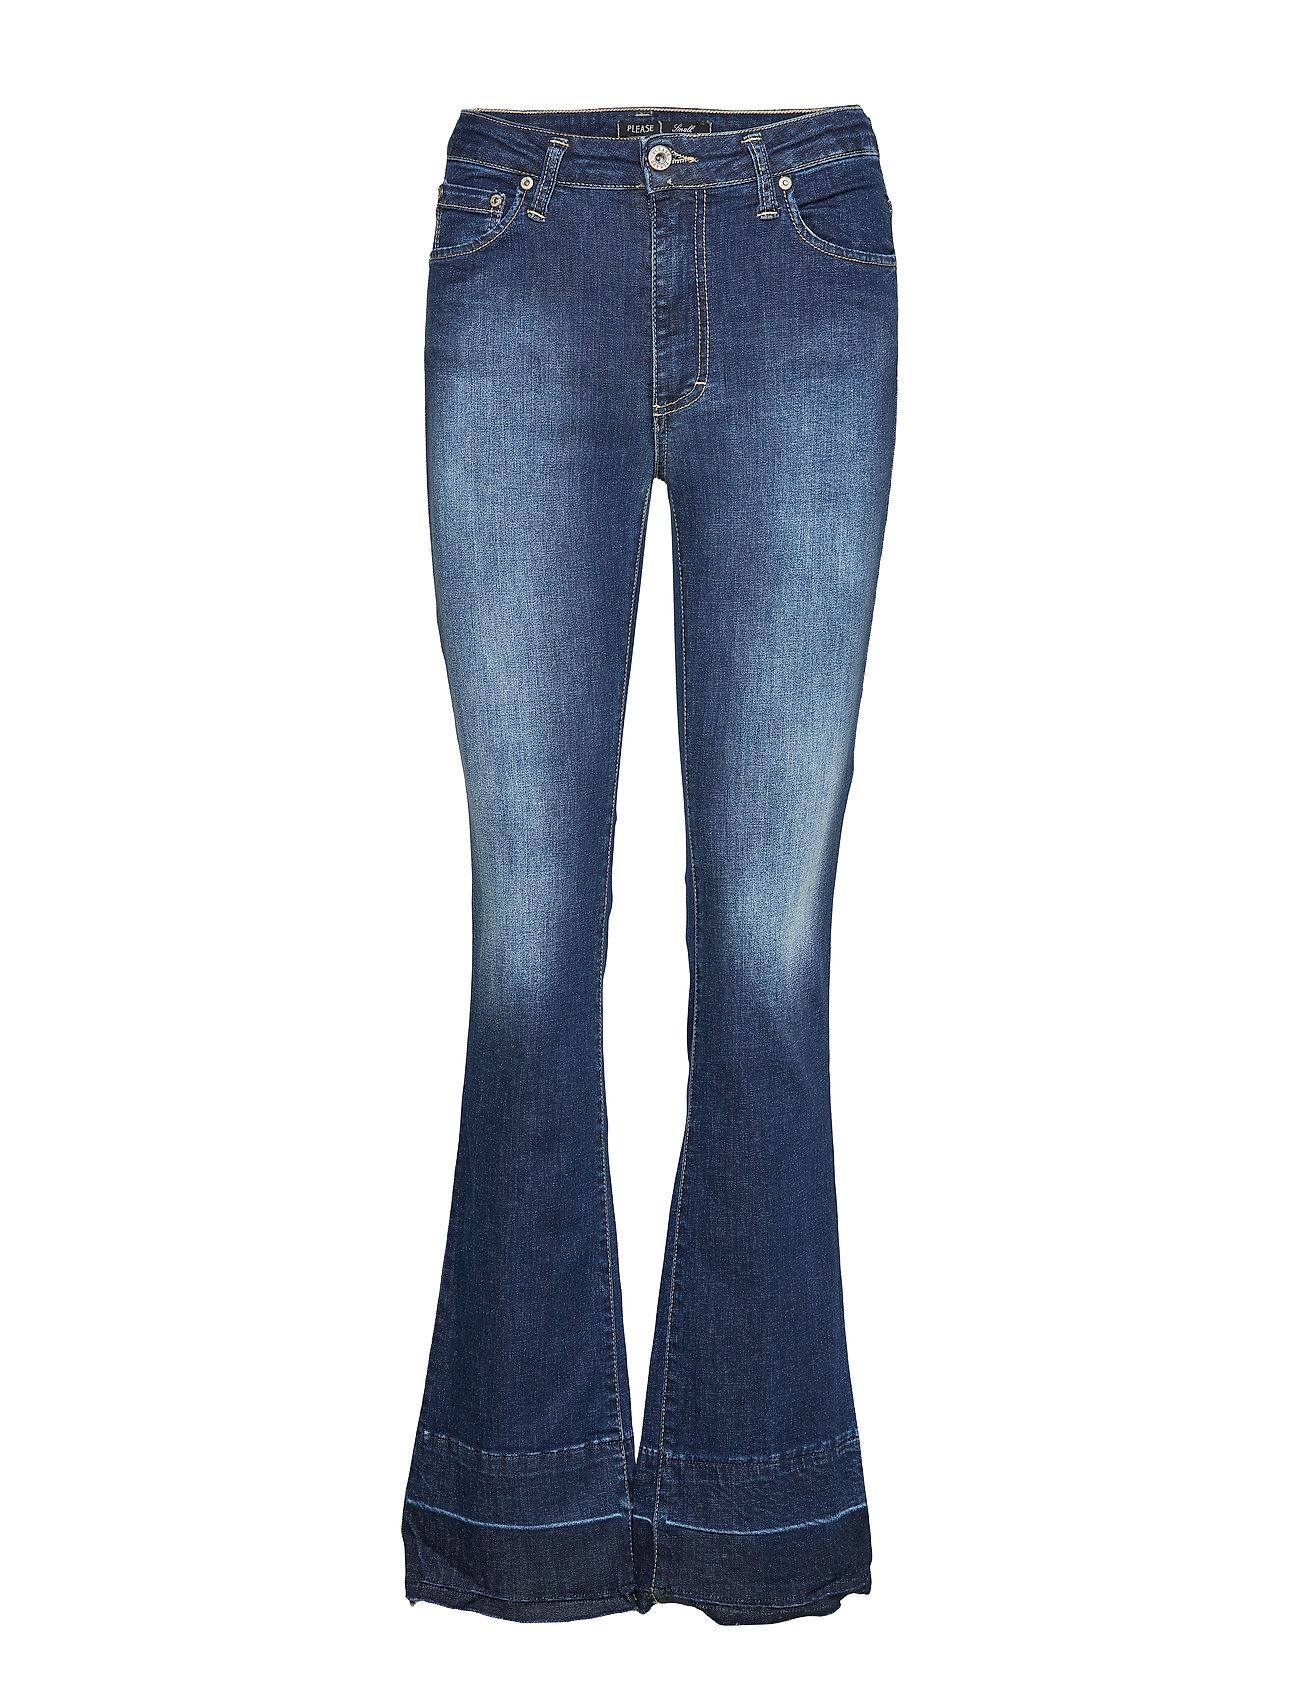 Please Jeans LONGCUT RAW EDGE OSLO - BLU DENIM